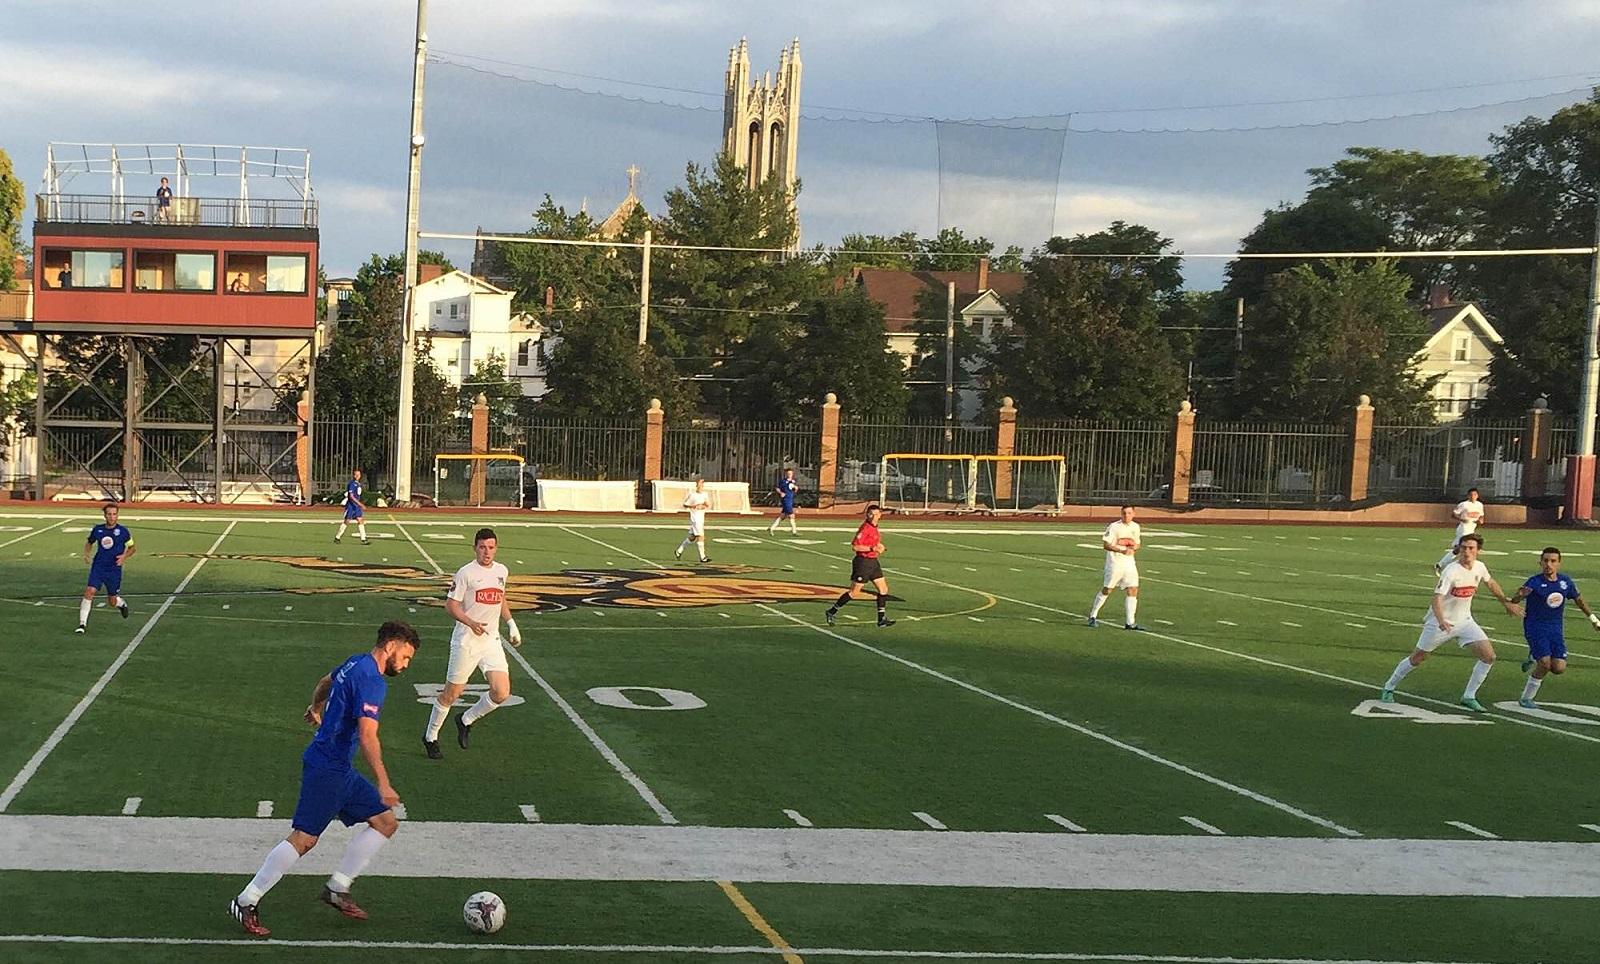 Kieran Toland, in white closest to the ball, watches as Scott Byrum prepares to play a long ball forward. (Ben Tsujimoto/Buffalo News)